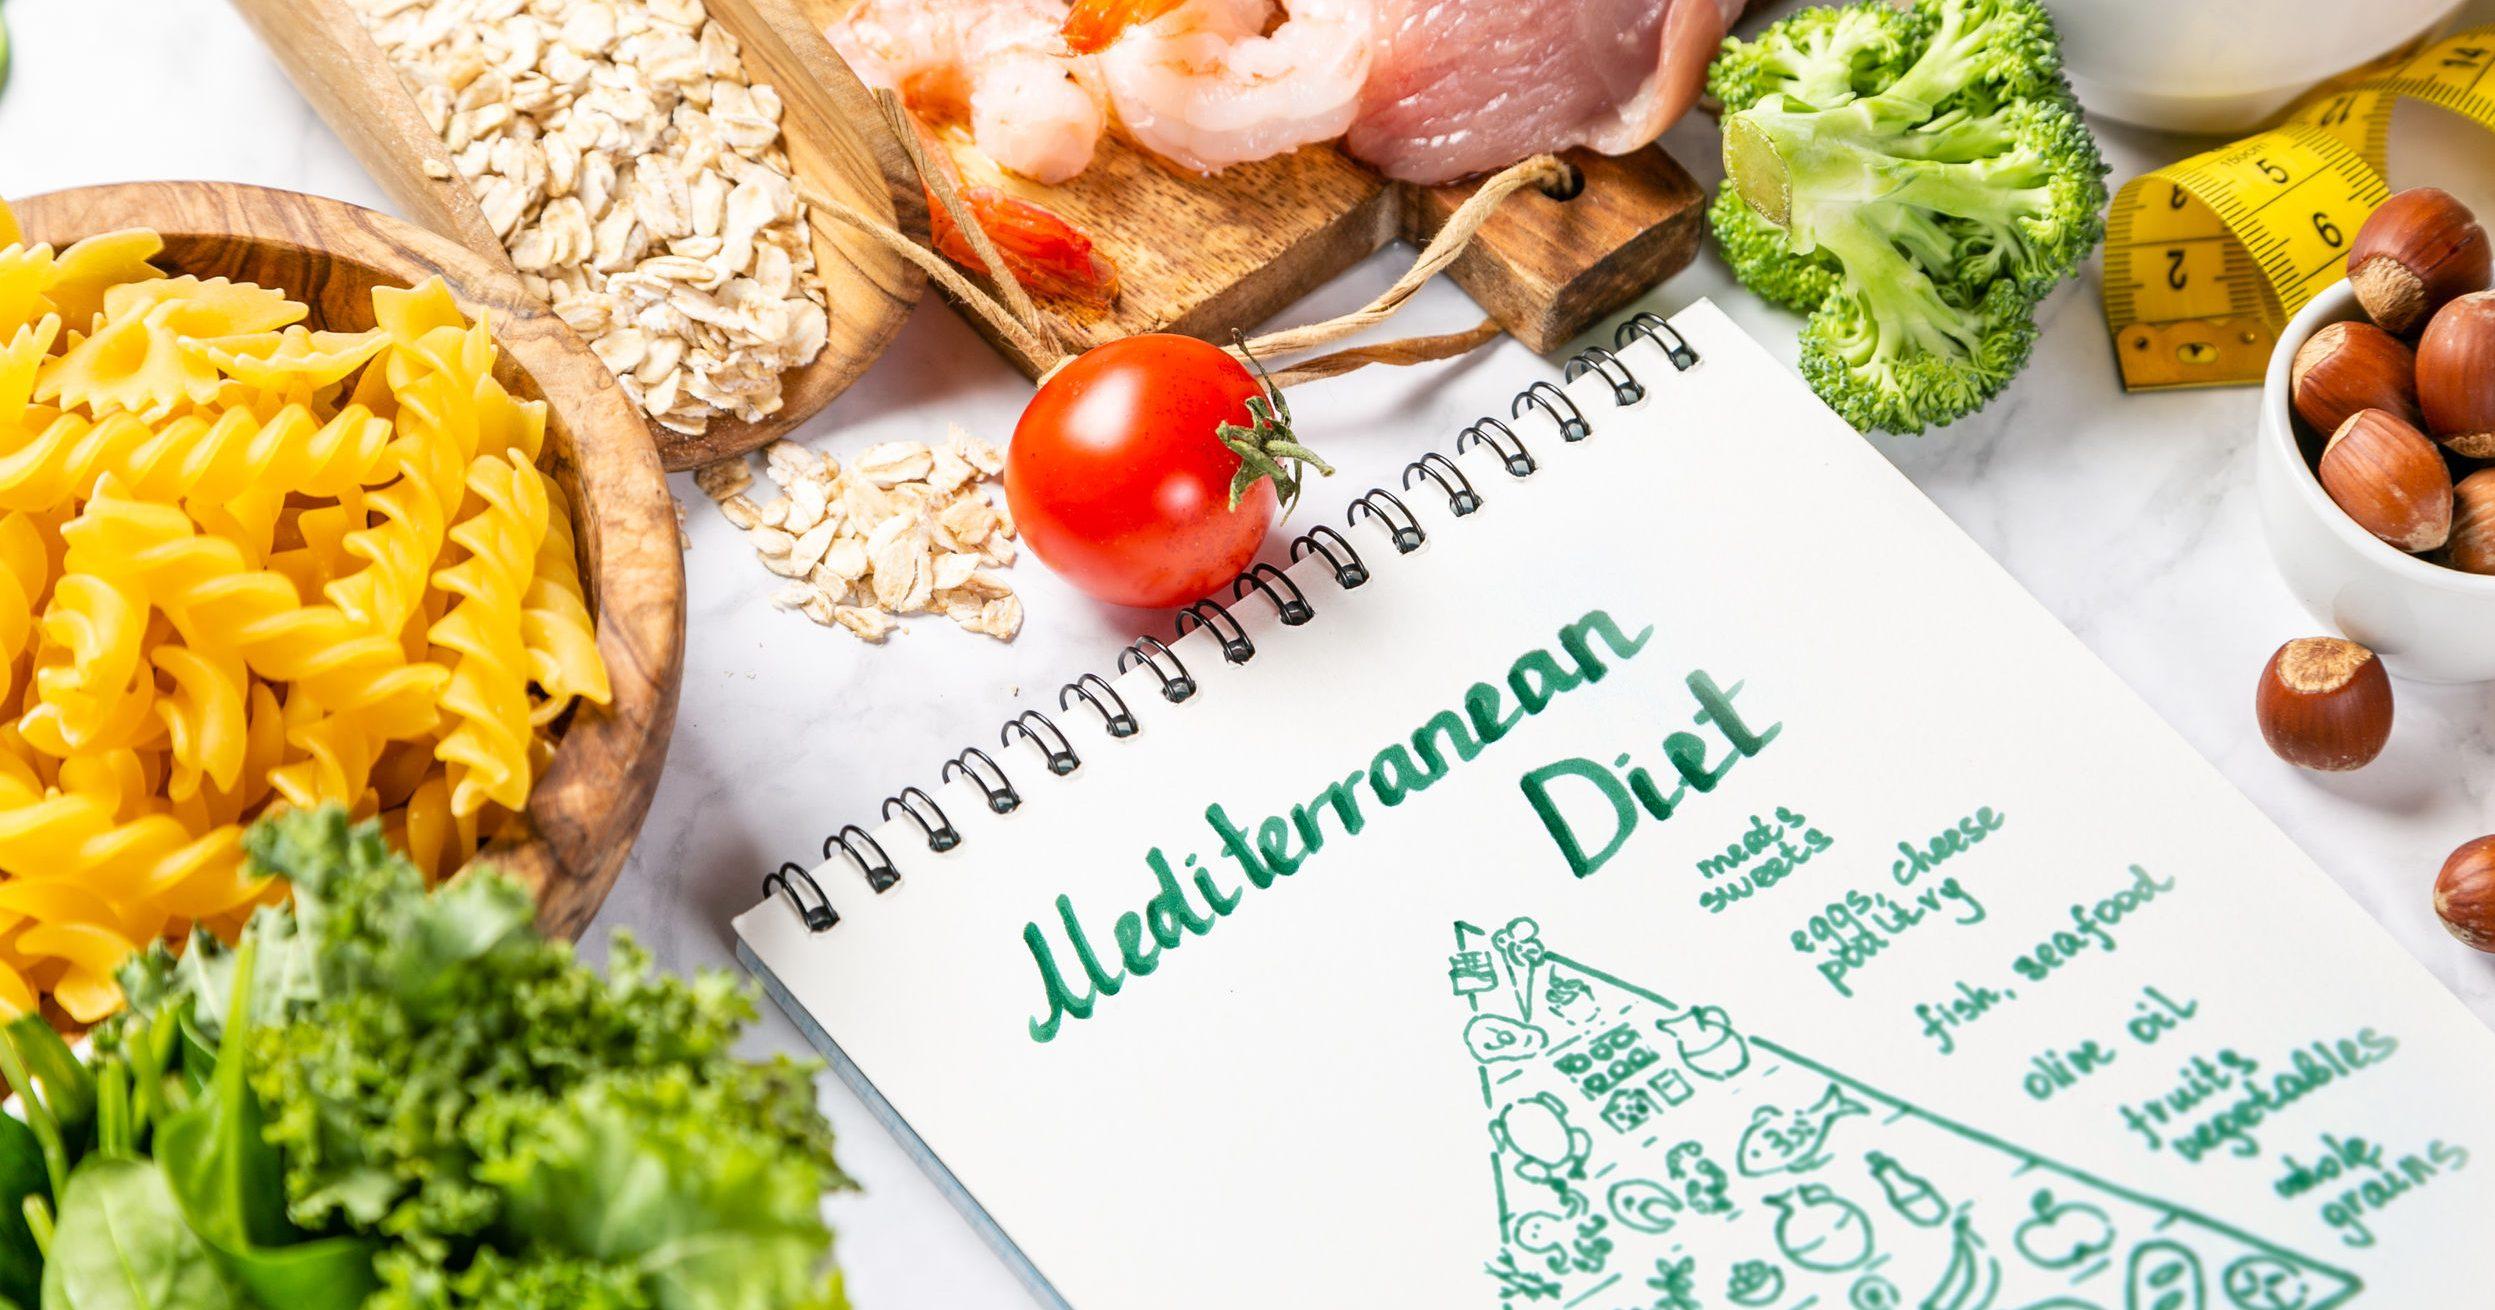 Dieta mediterrânea: O que é e como aproveitar ao máximo?